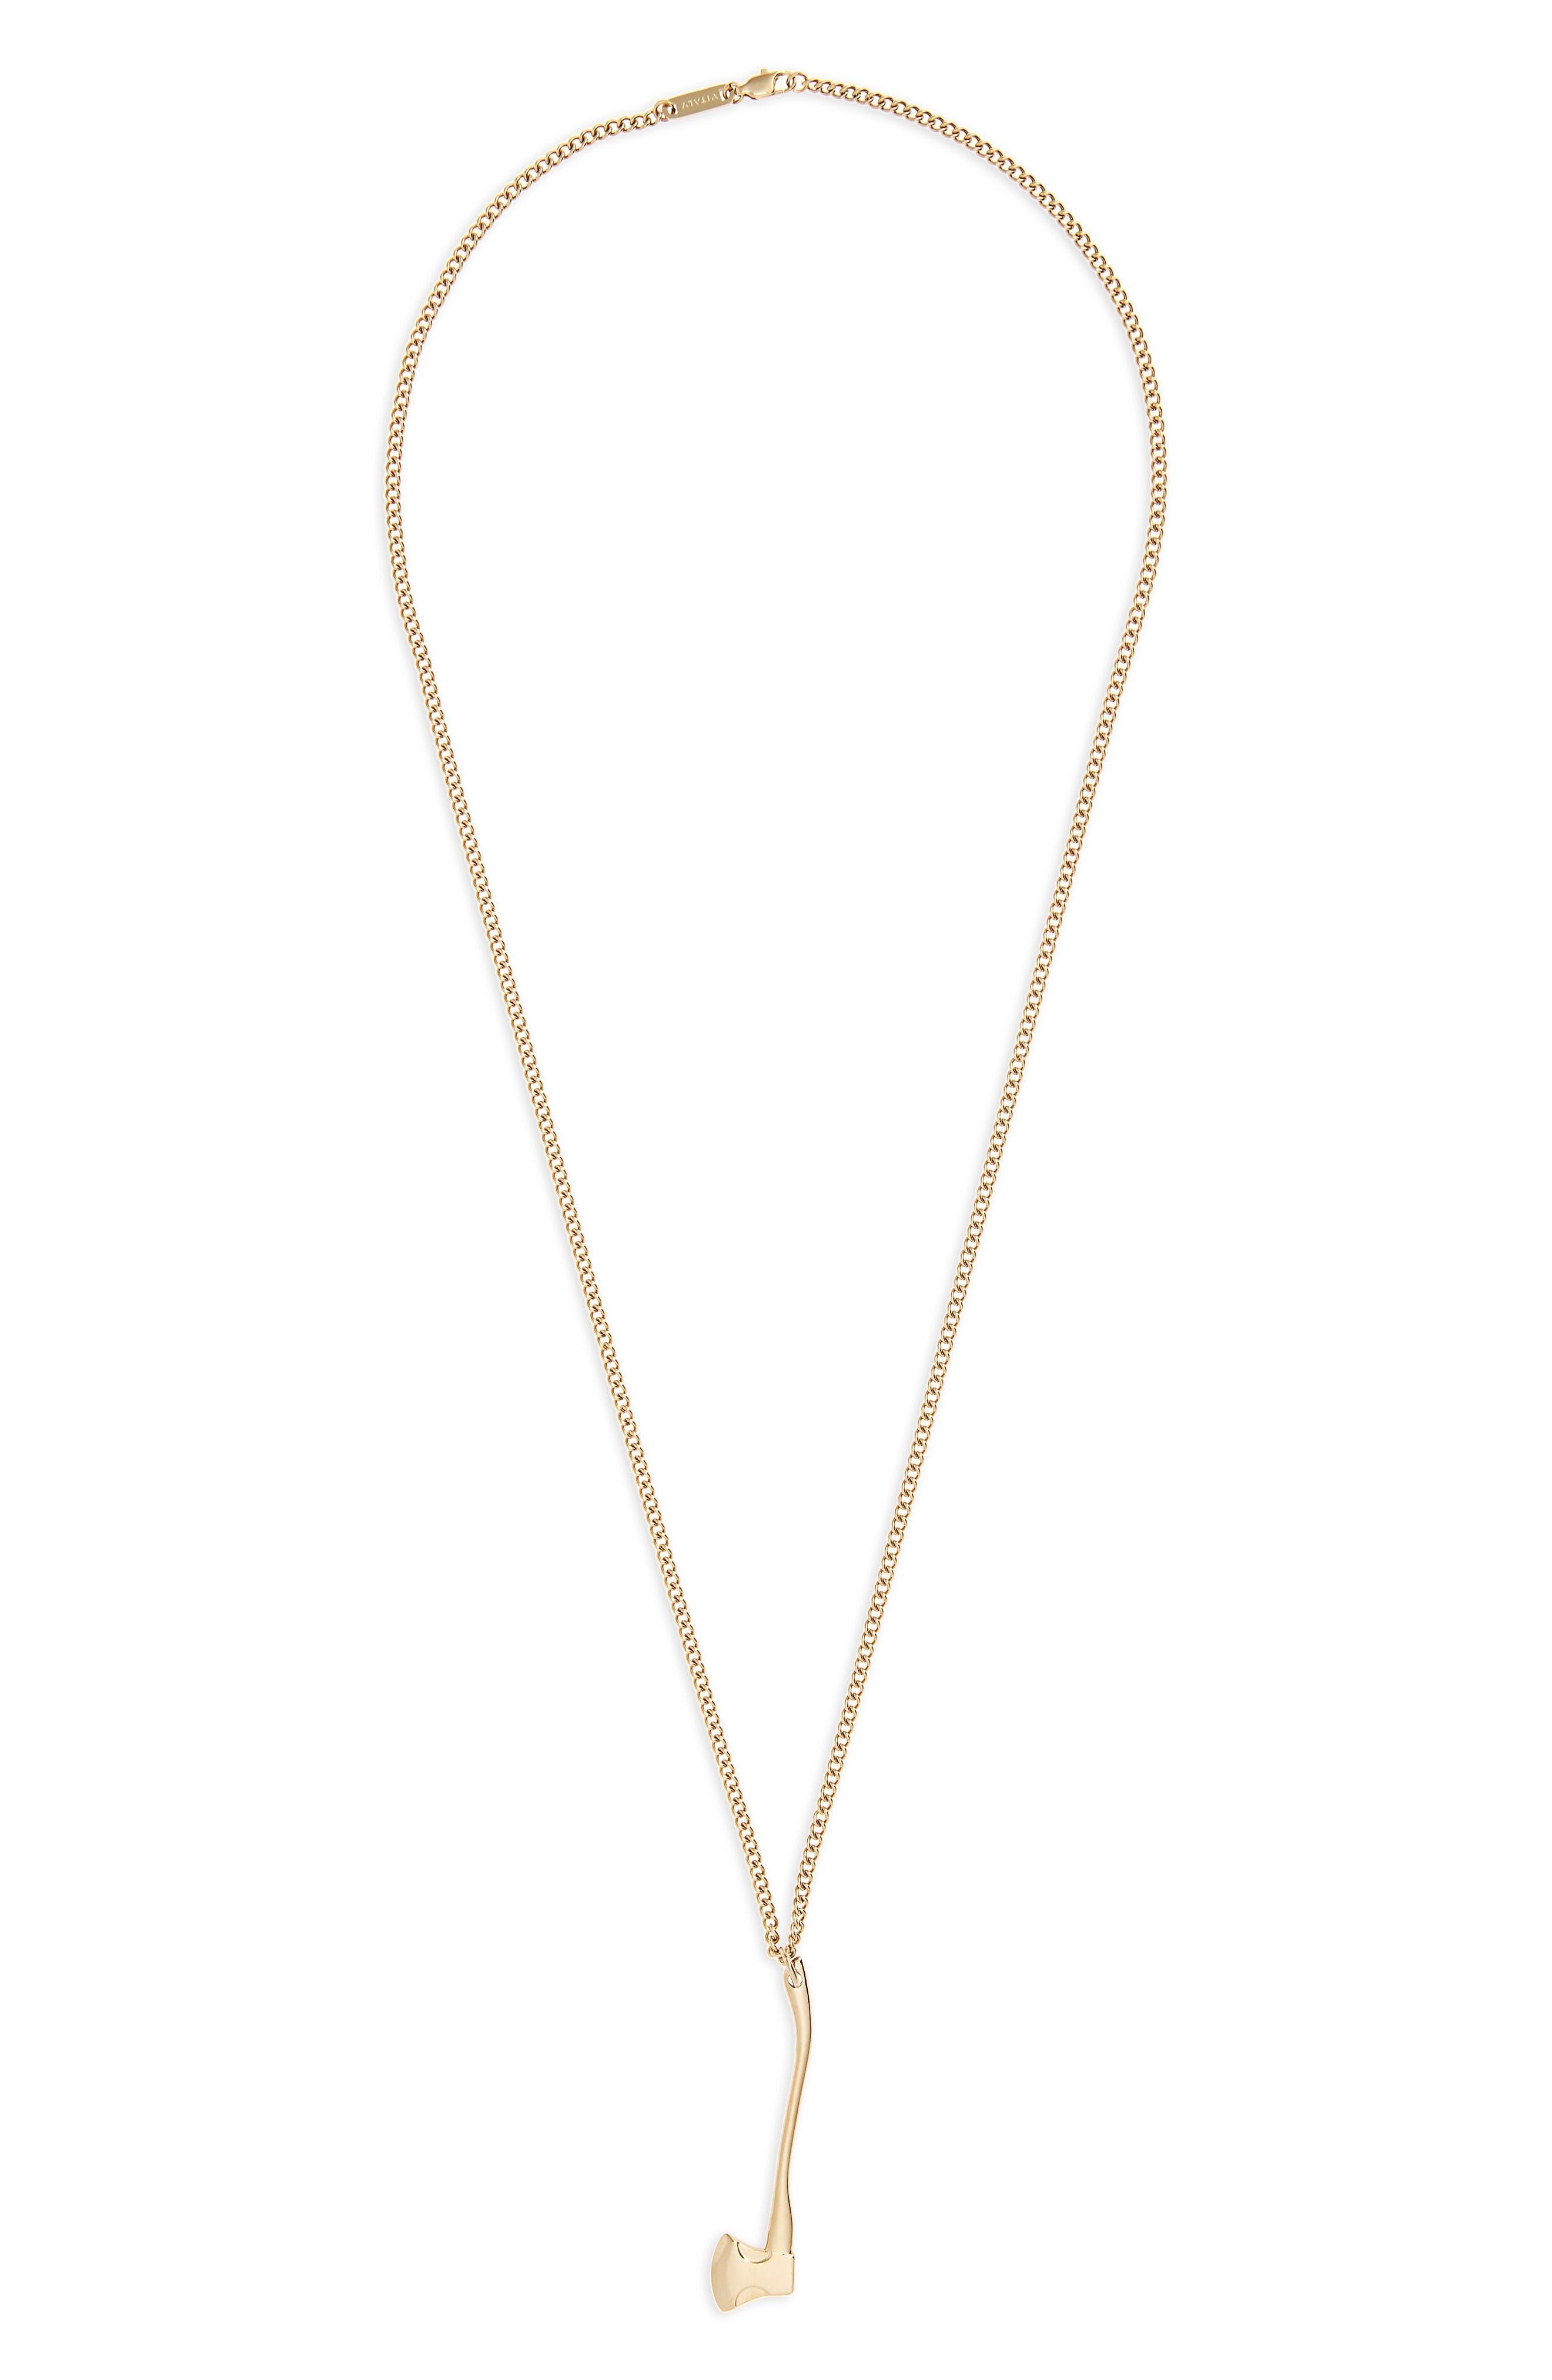 Main Image - Vitaly Sequoia Pendant Necklace